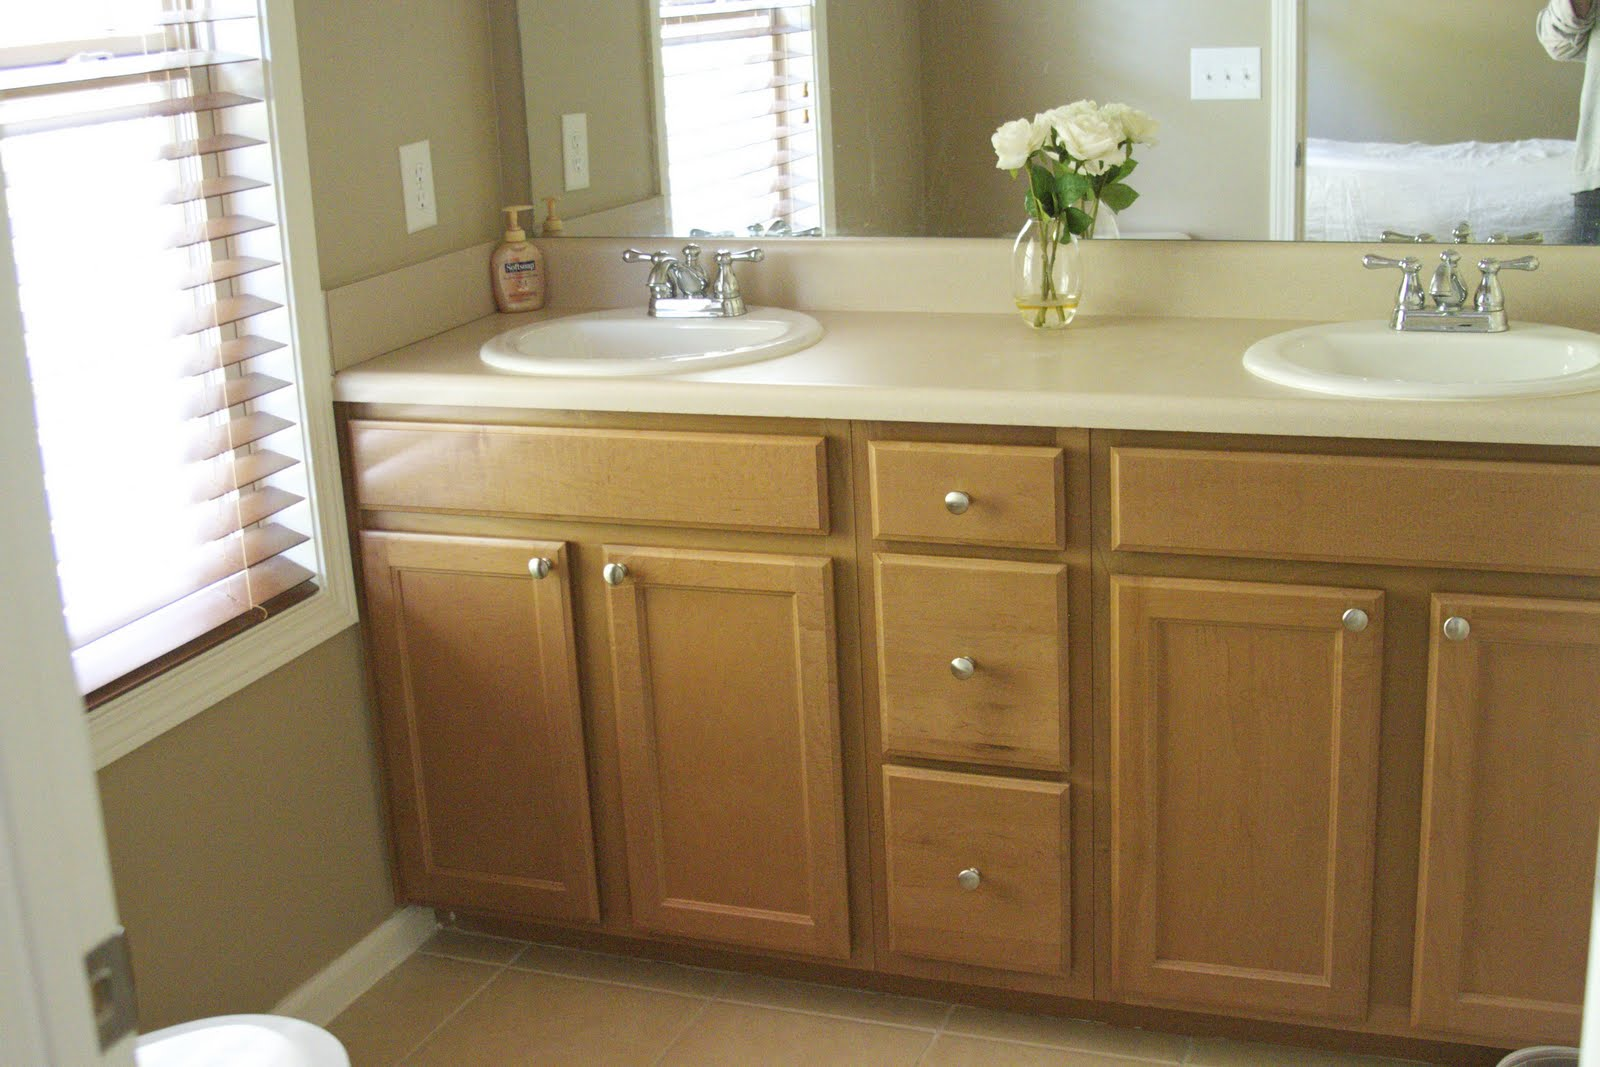 210 west marietta street canton ga 30114 Bathroom cabinets marietta ga